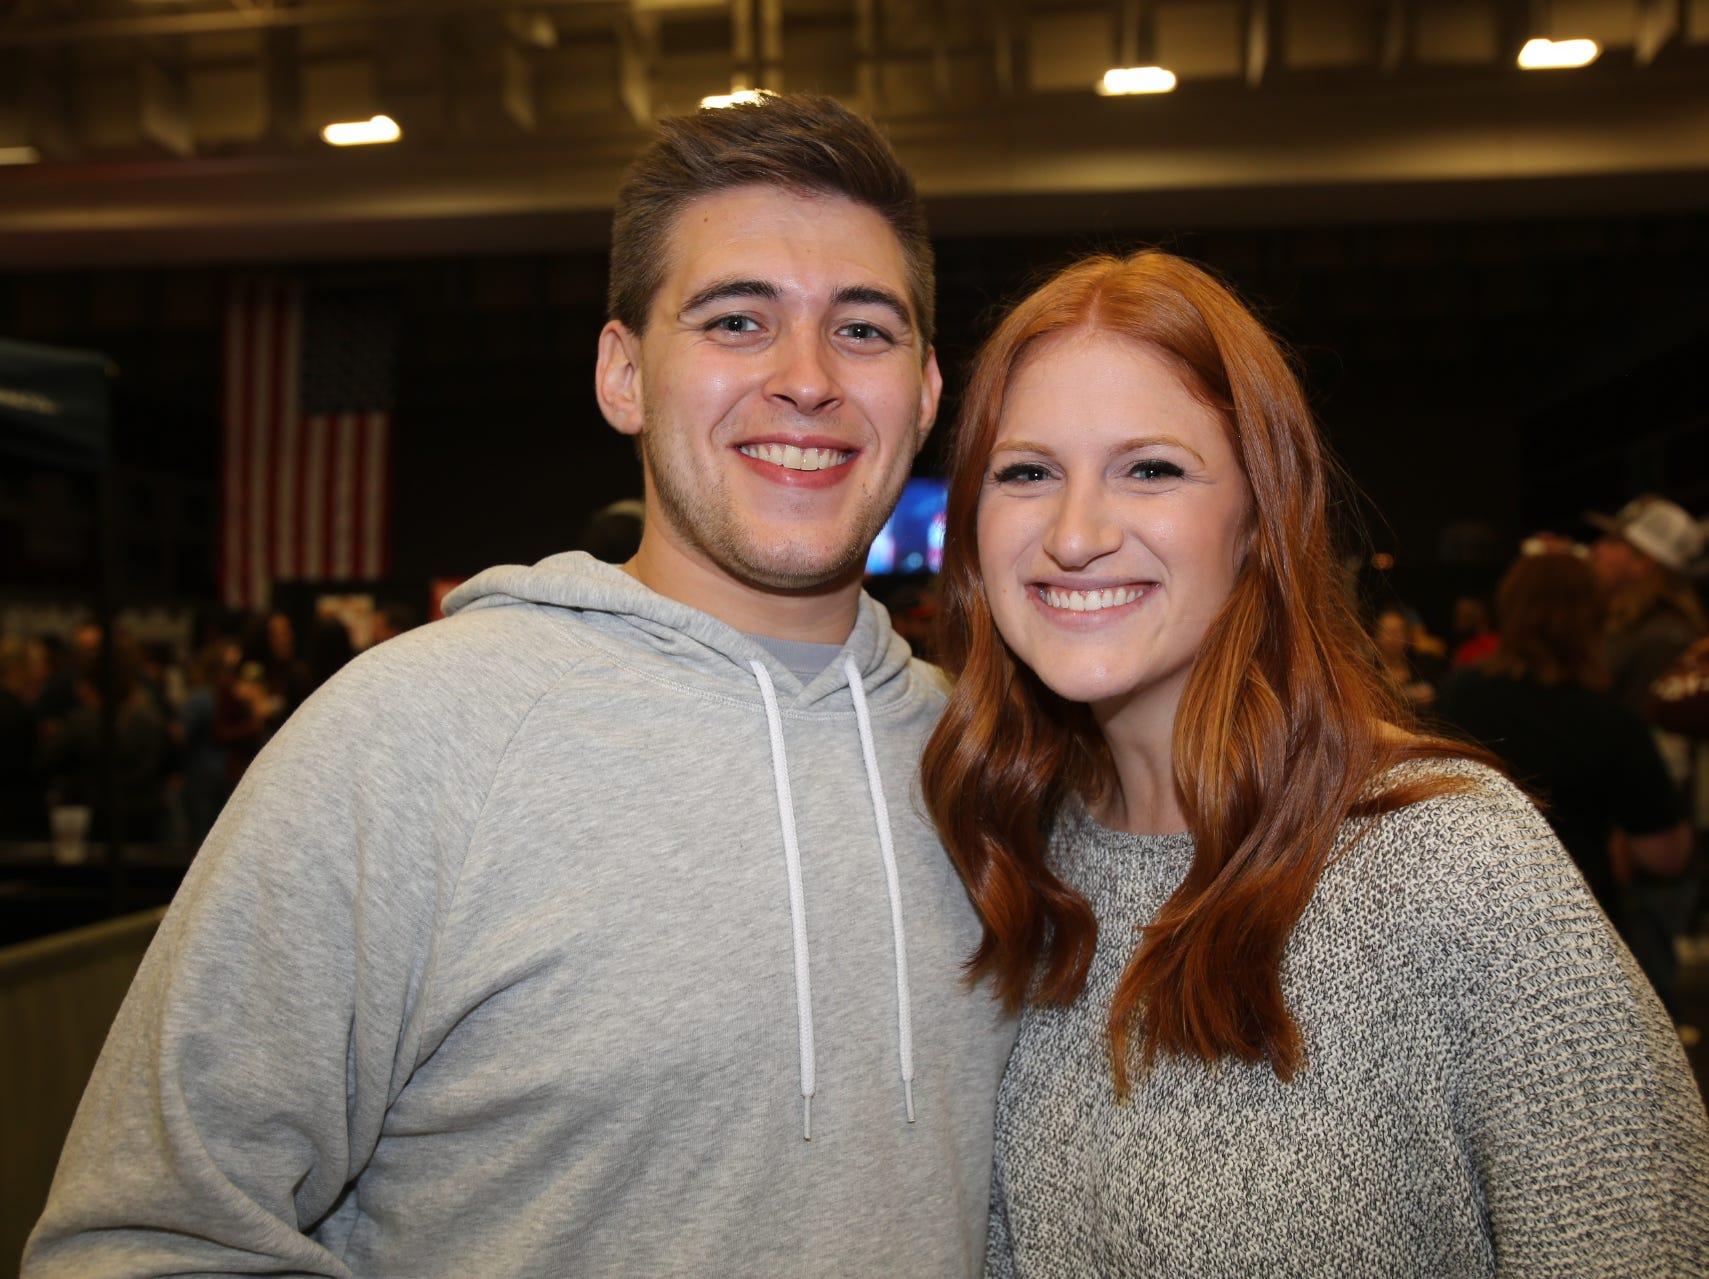 Cody Gaston and Sarah Ross